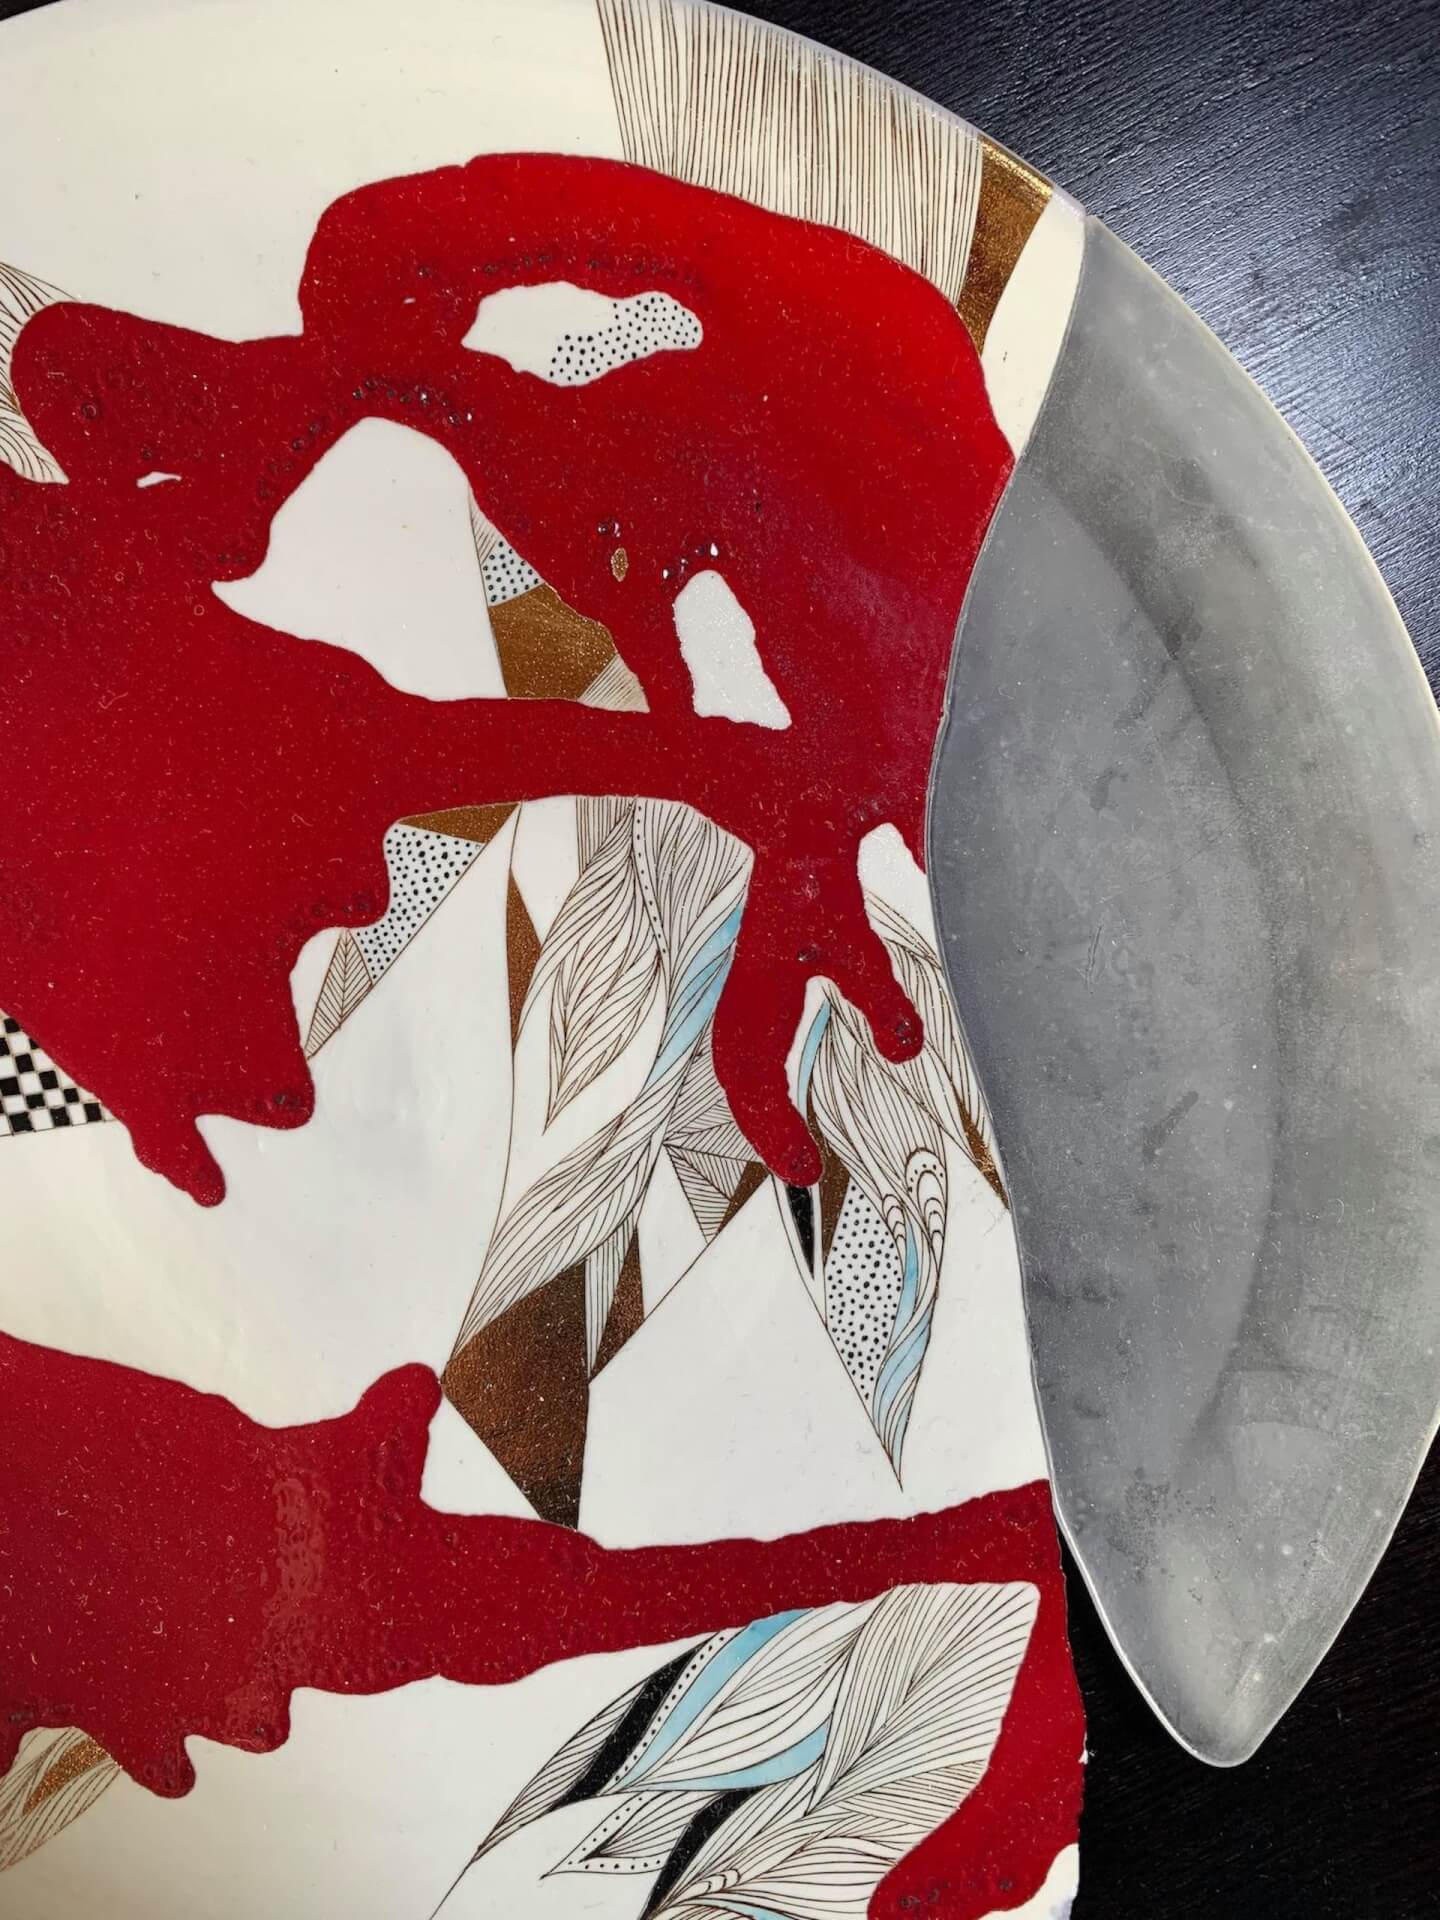 BnA Alter Museumホテル開業2周年記念!アートルーム制作に参加したアーティストによるグループ展が開催 art210419_bnaaltermuseum-210419_10